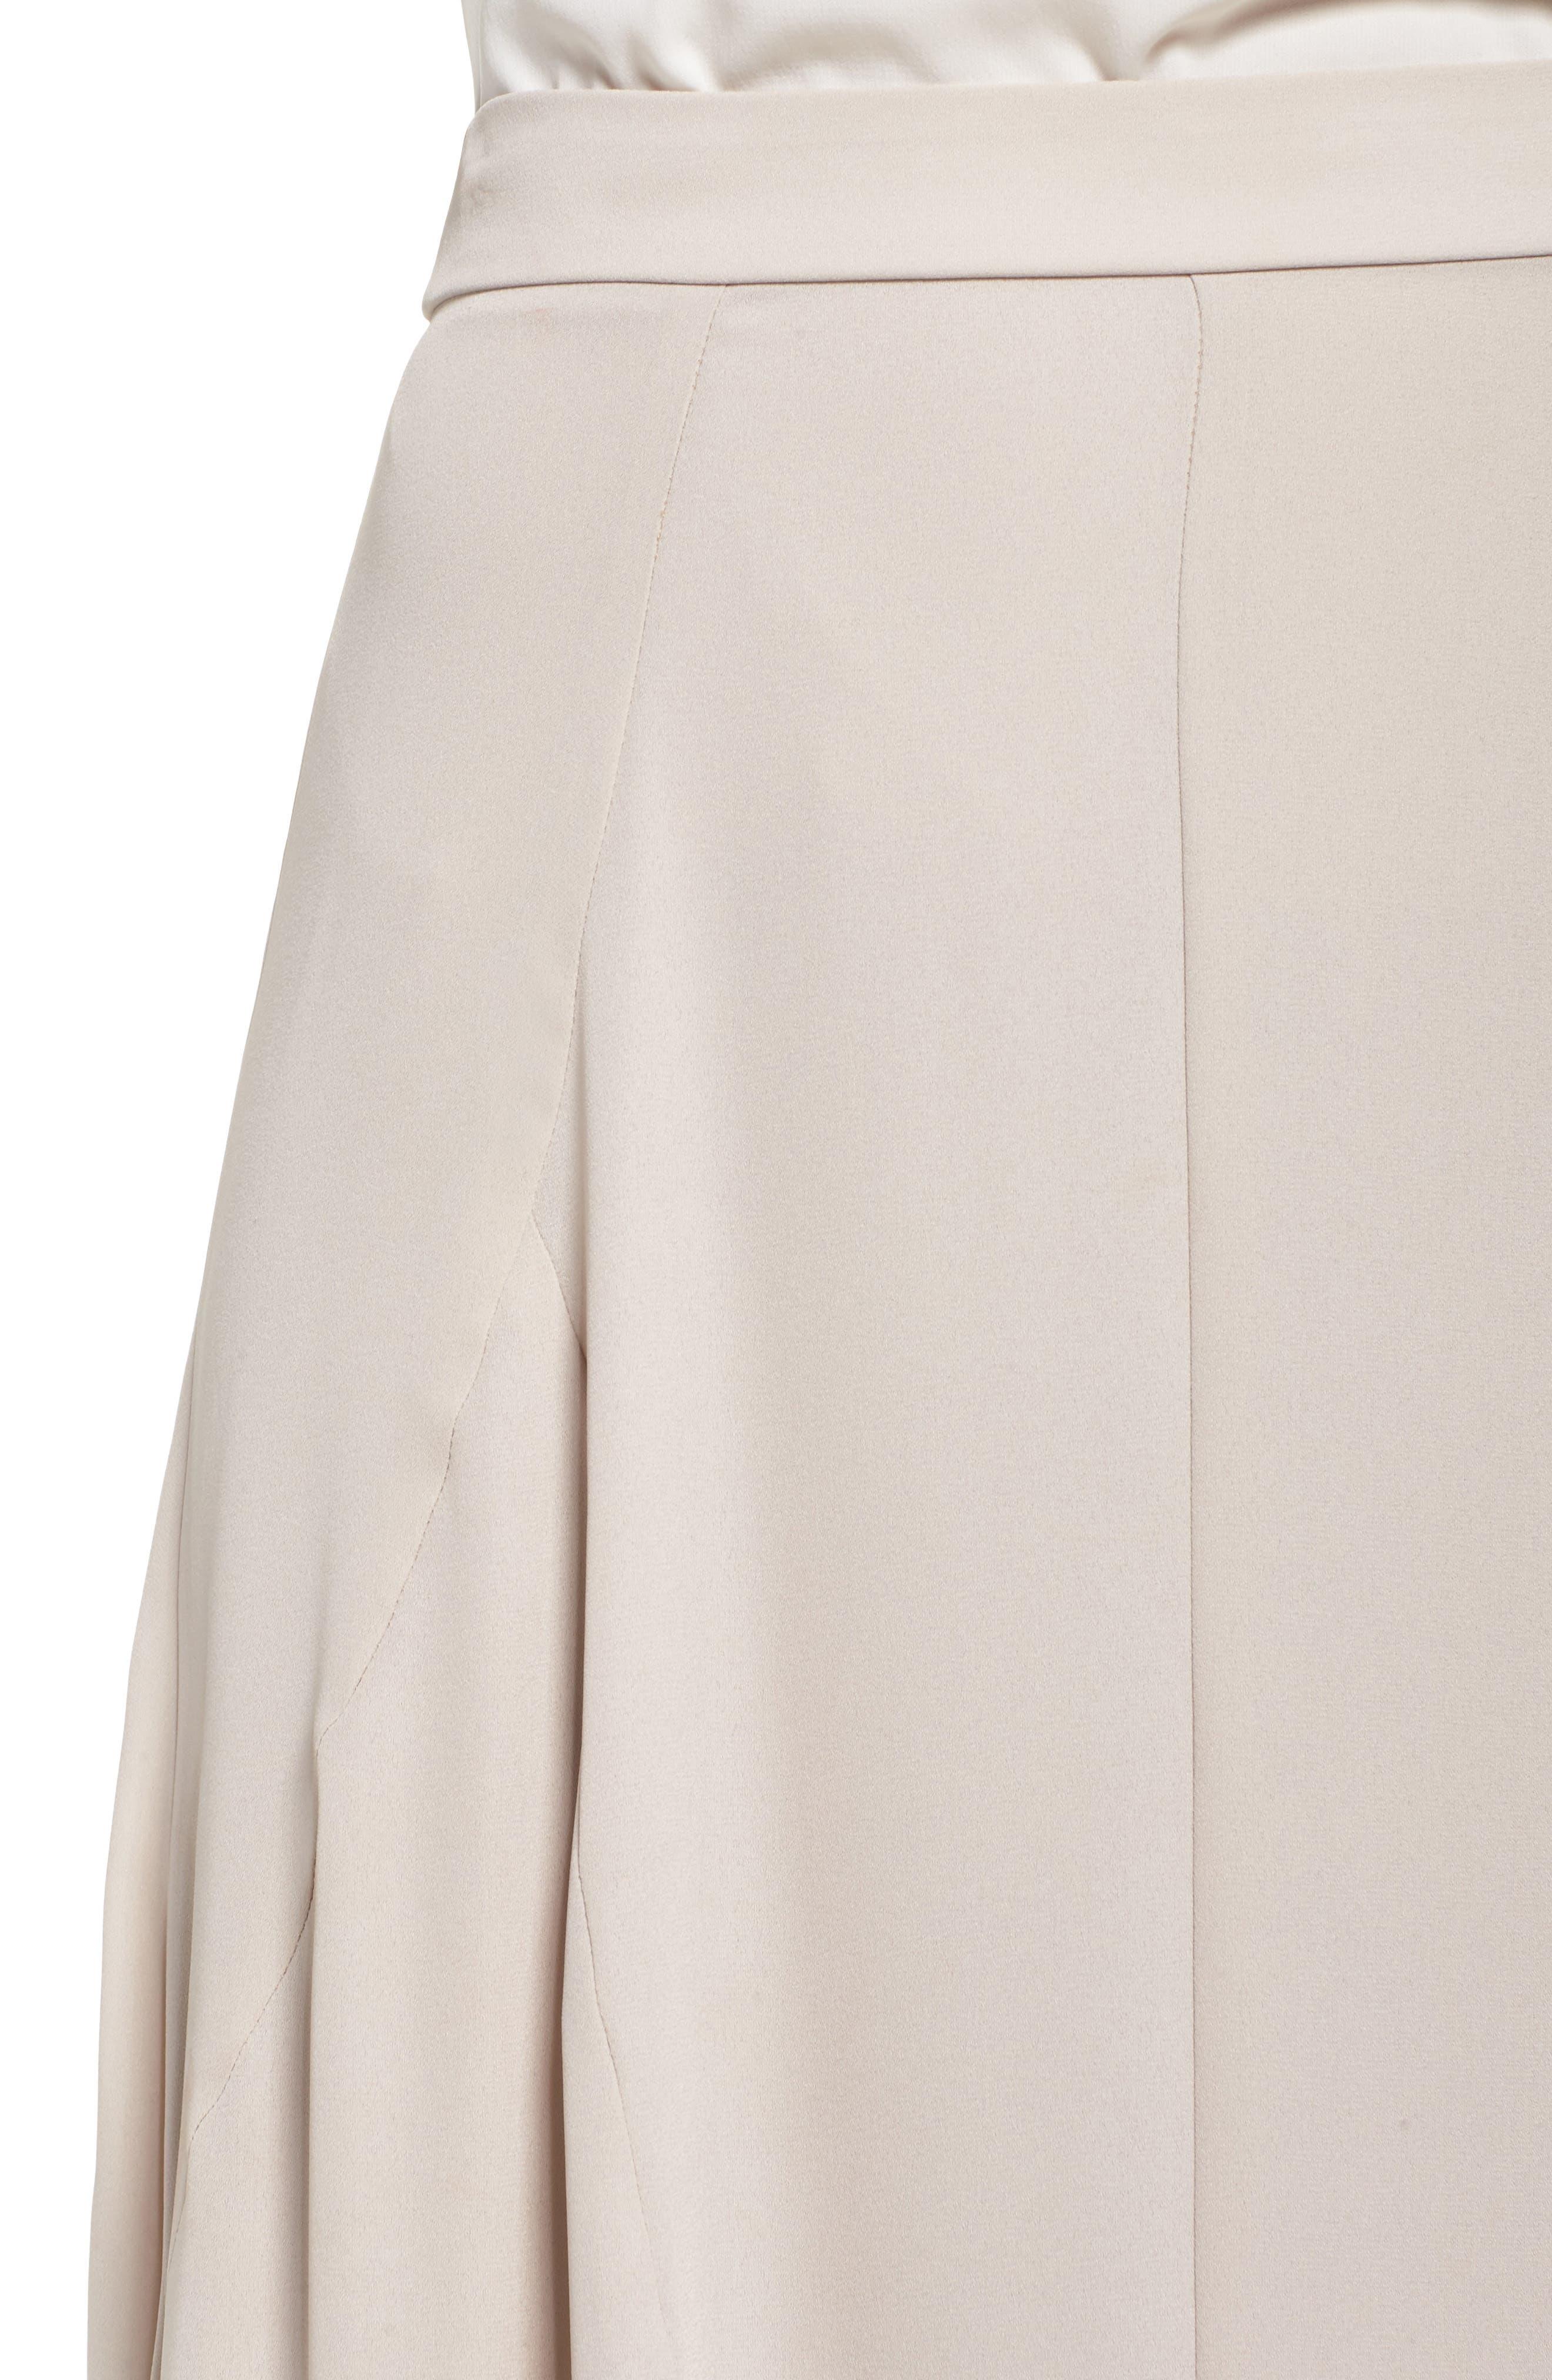 Chiffon Skirt,                             Alternate thumbnail 7, color,